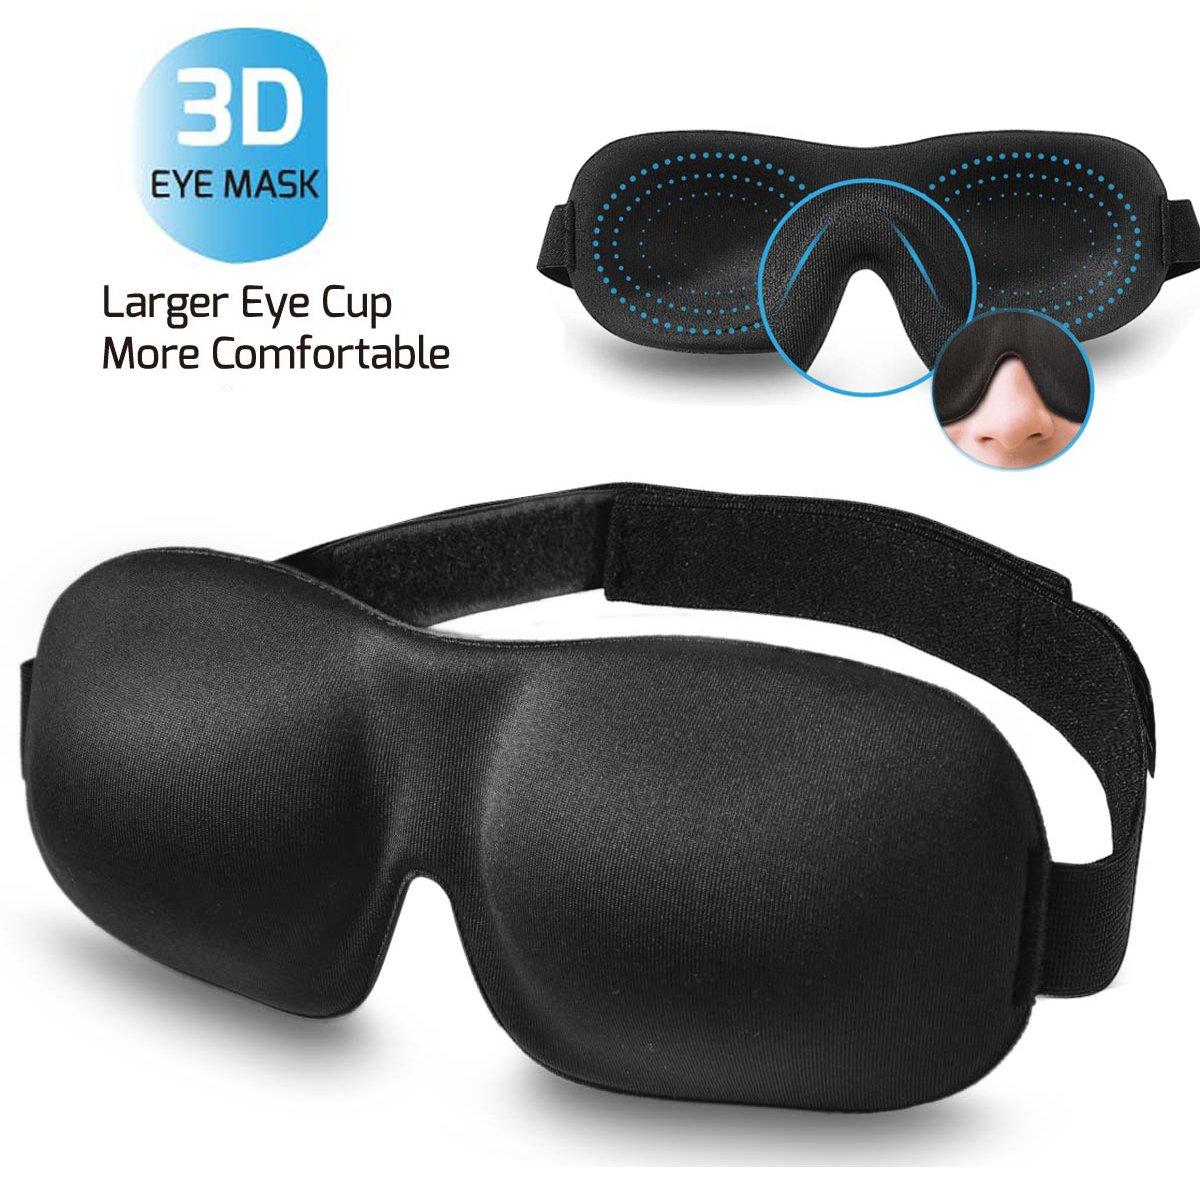 Amazon 3D Sleep Eye Mask Cover Lightweight and fortable